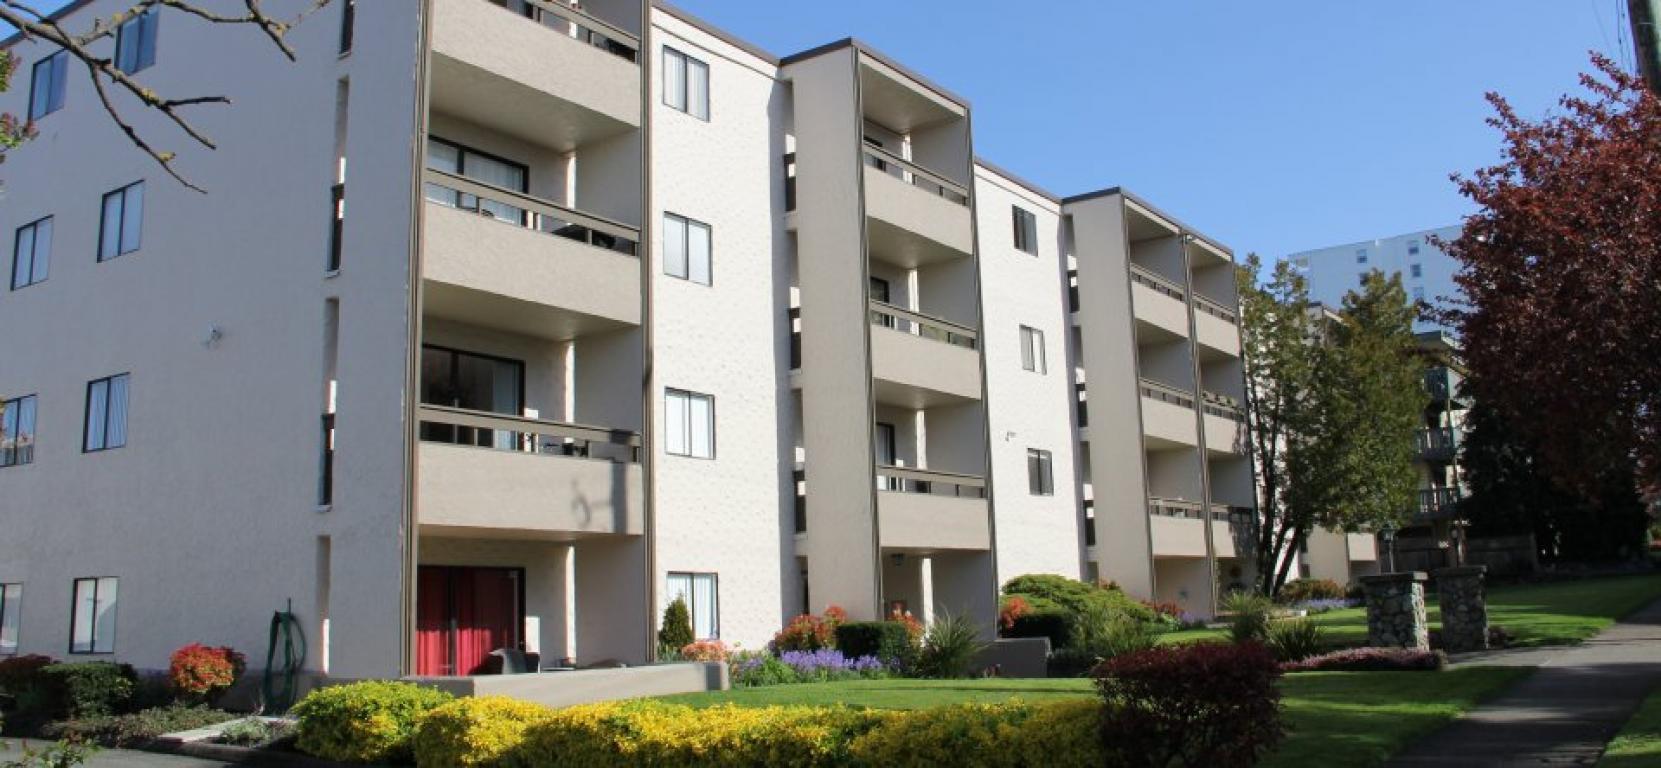 Croft House Apartments